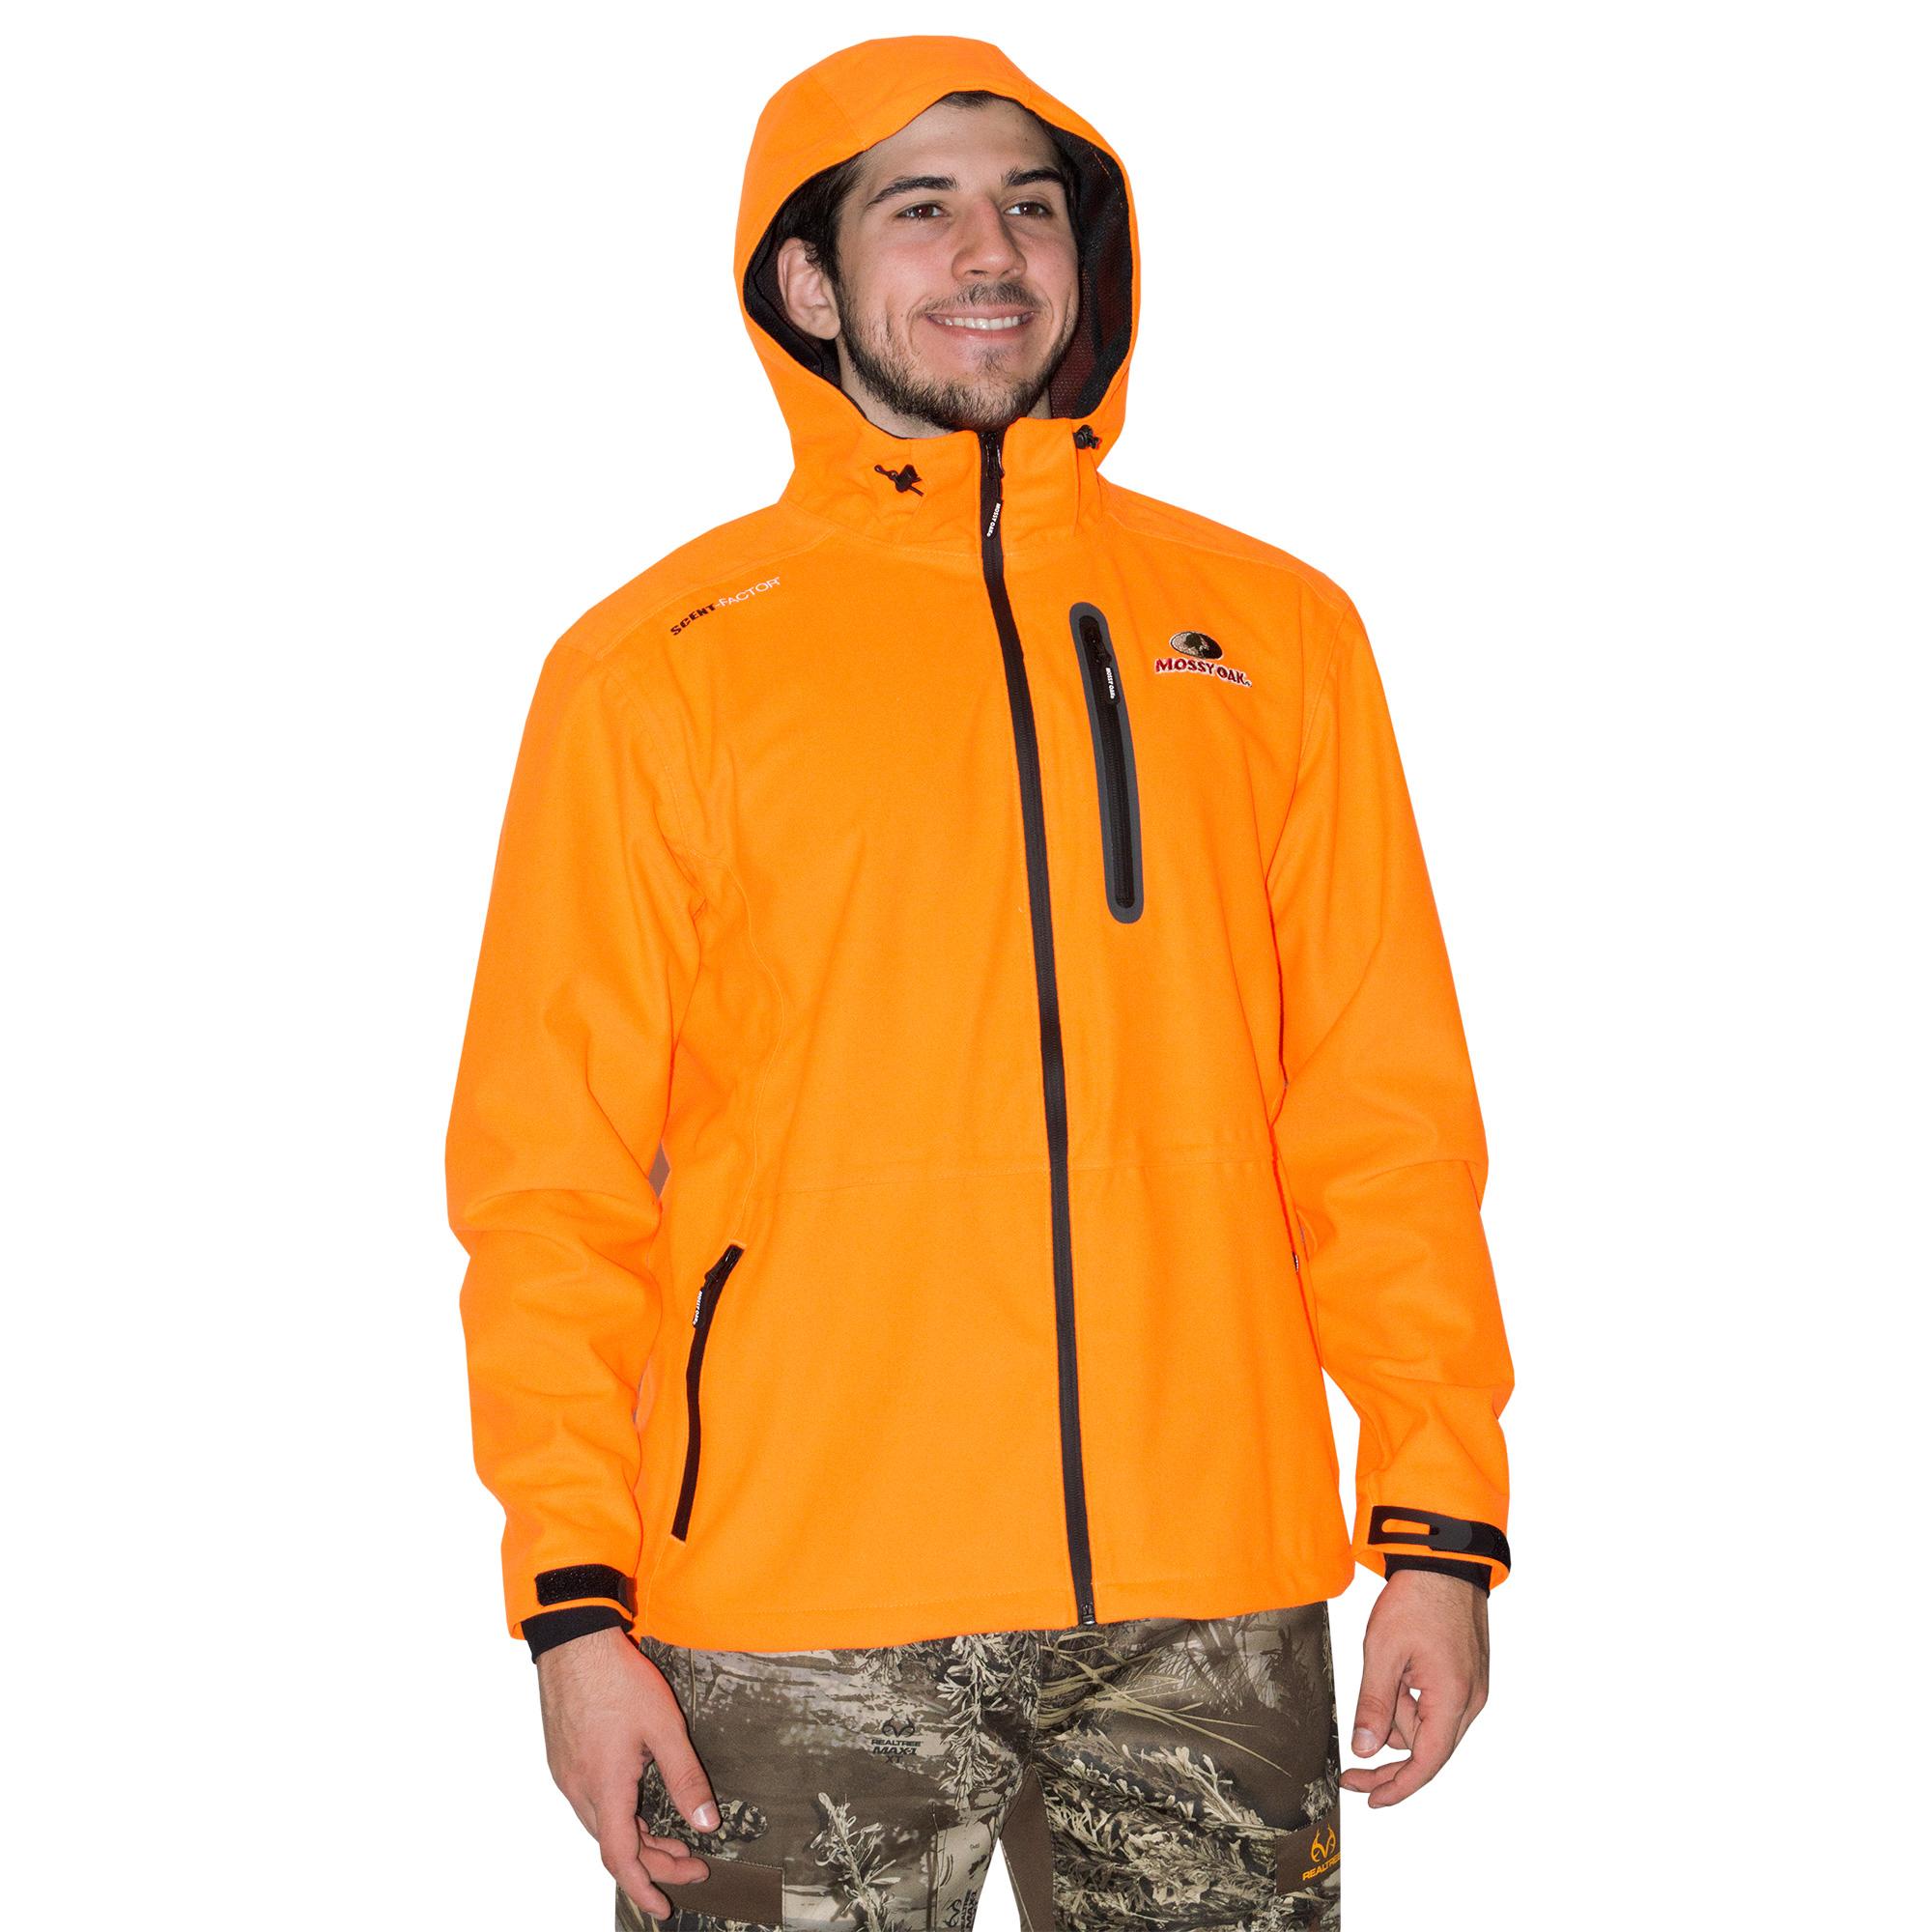 Mossy Oak Blaze Men's Scent Control Jacket